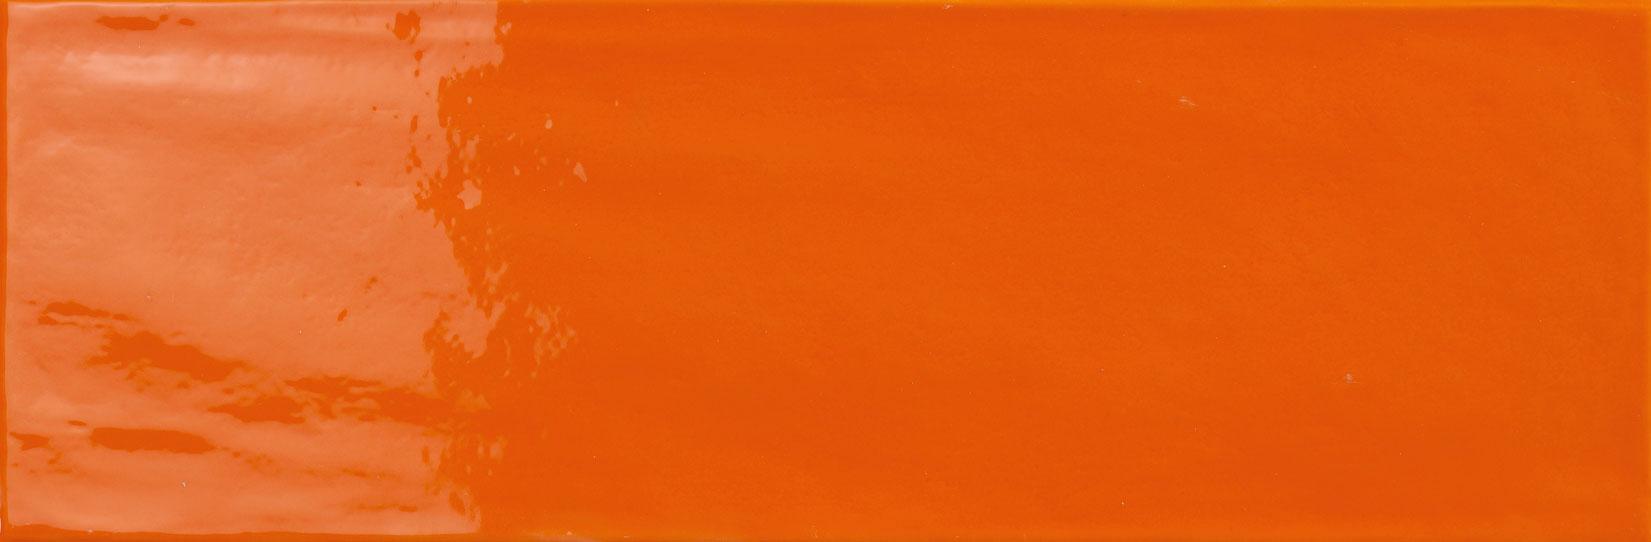 Arancio 20x60